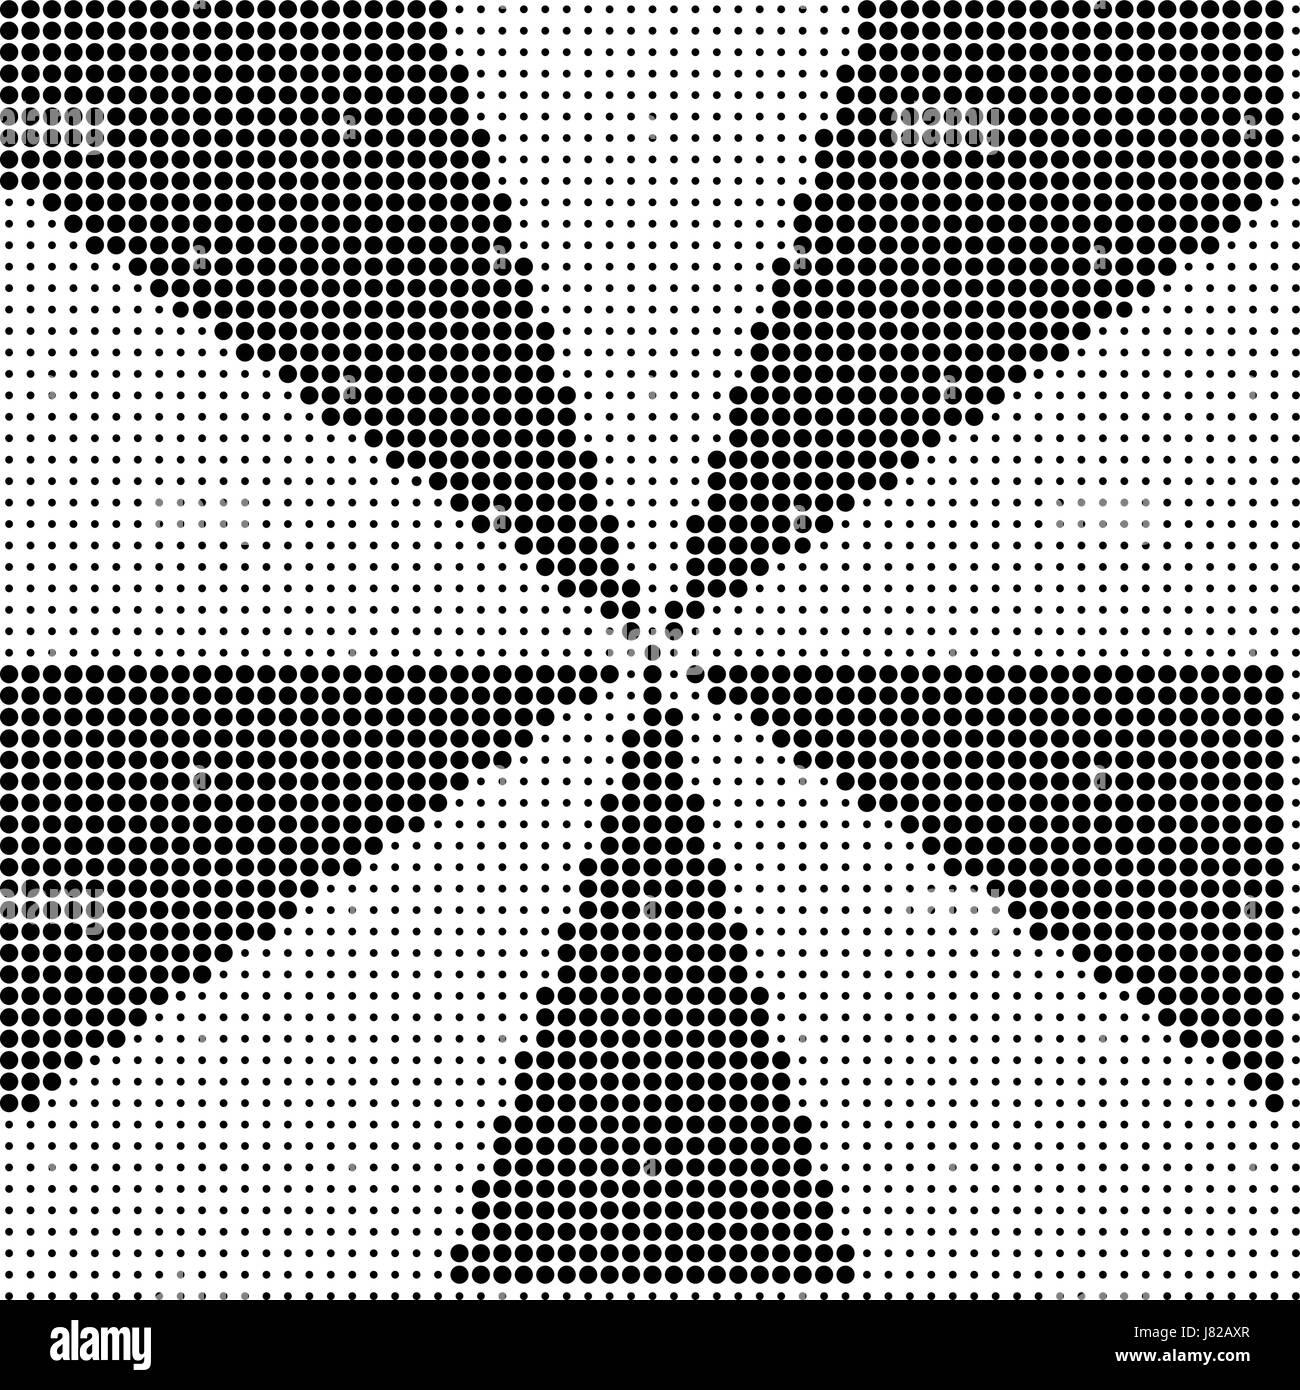 Abstract  halftone dot vector - Stock Image